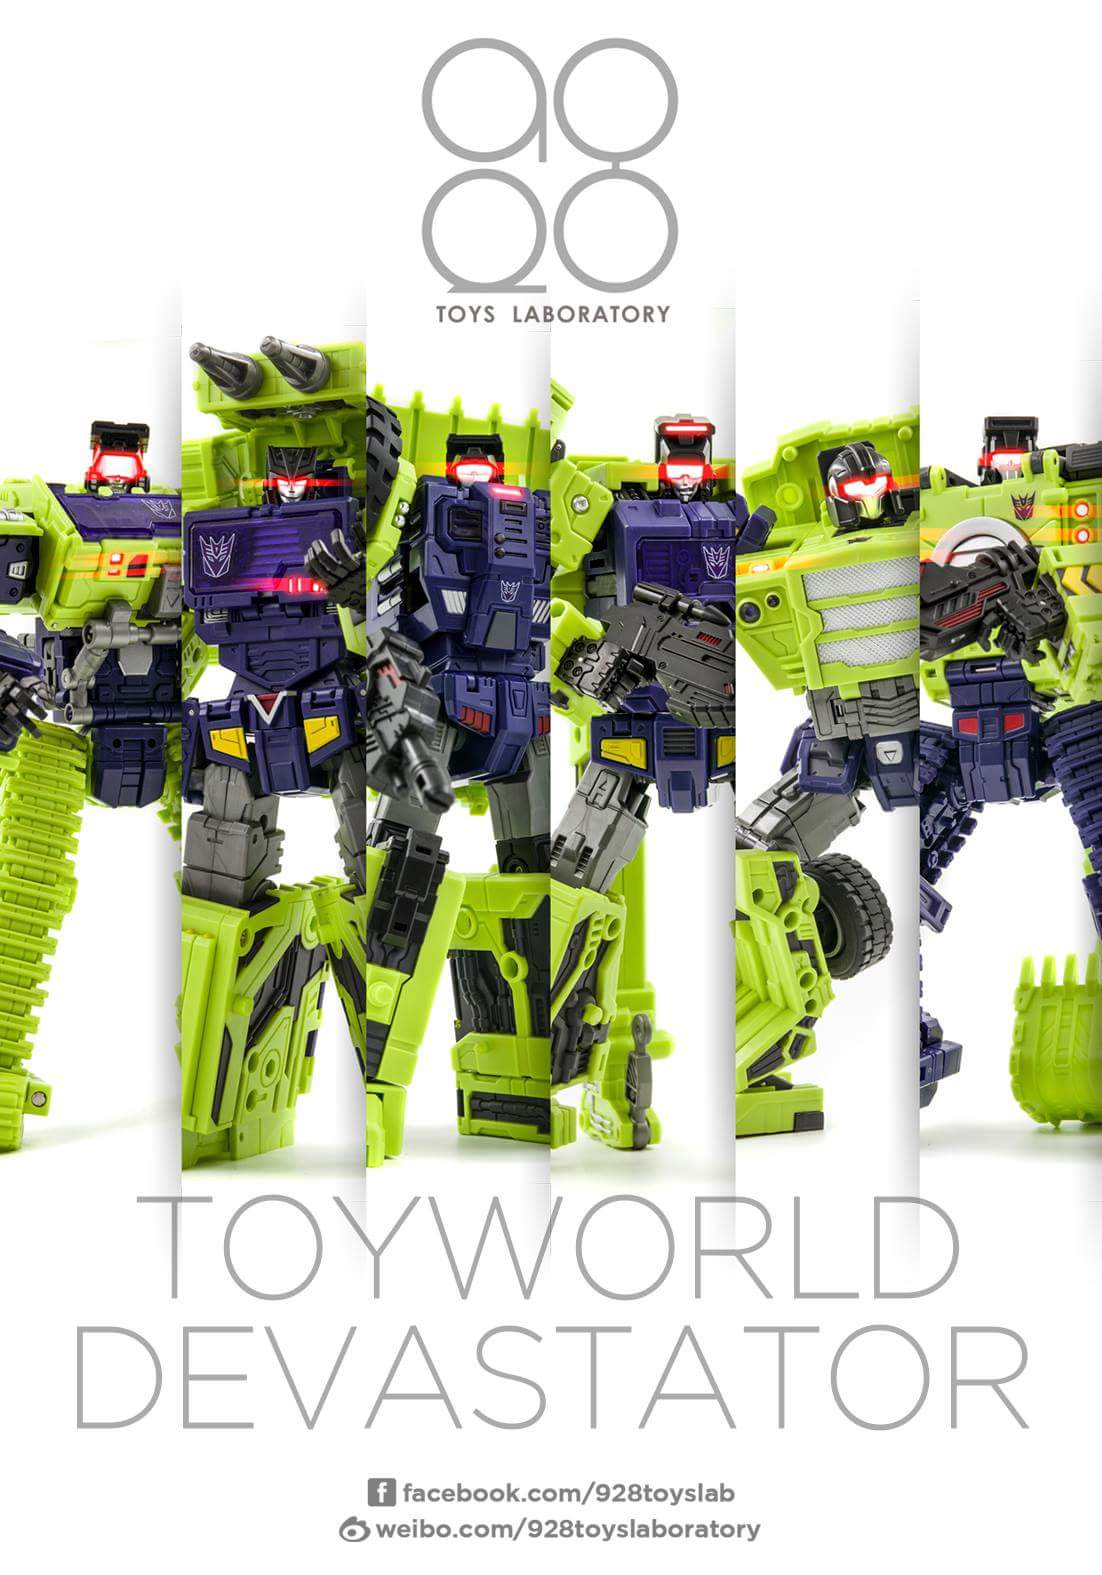 [Toyworld] Produit Tiers - Jouet TW-C Constructor aka Devastator/Dévastateur (Version vert G1 et jaune G2) - Page 7 Fzx1hqsH